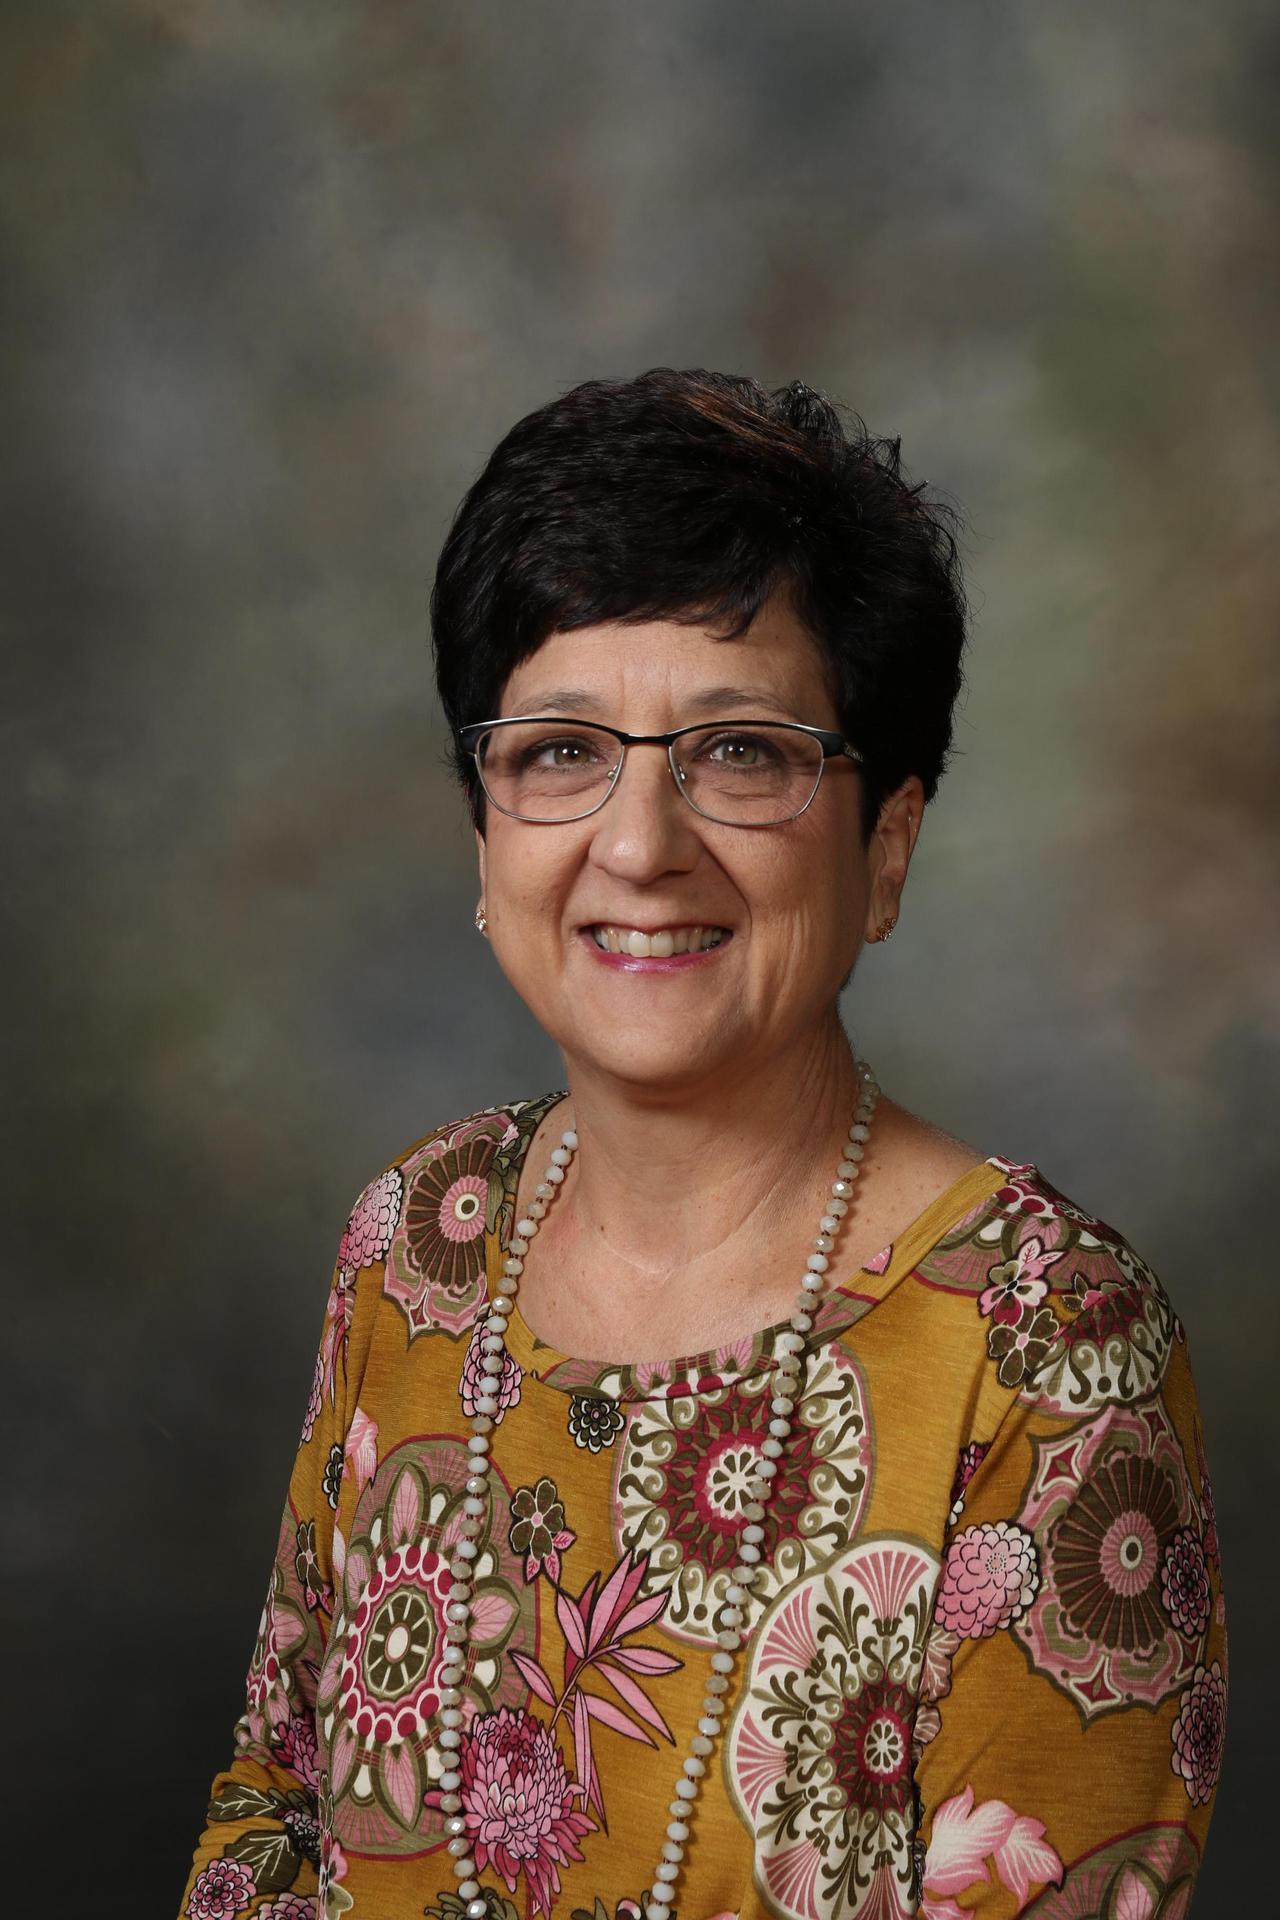 Ms. Rudd